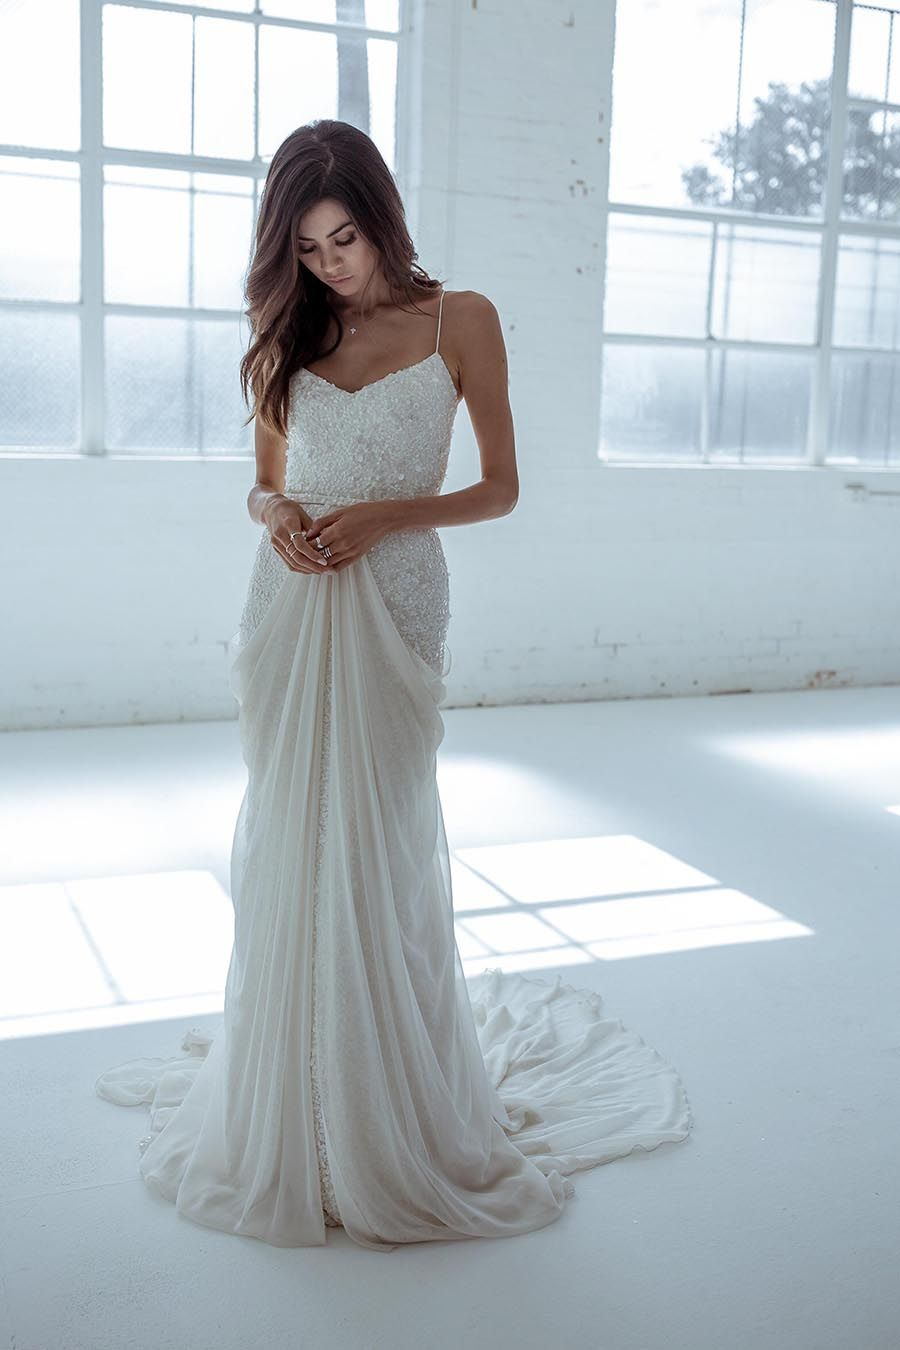 Judy ann santos wedding dress